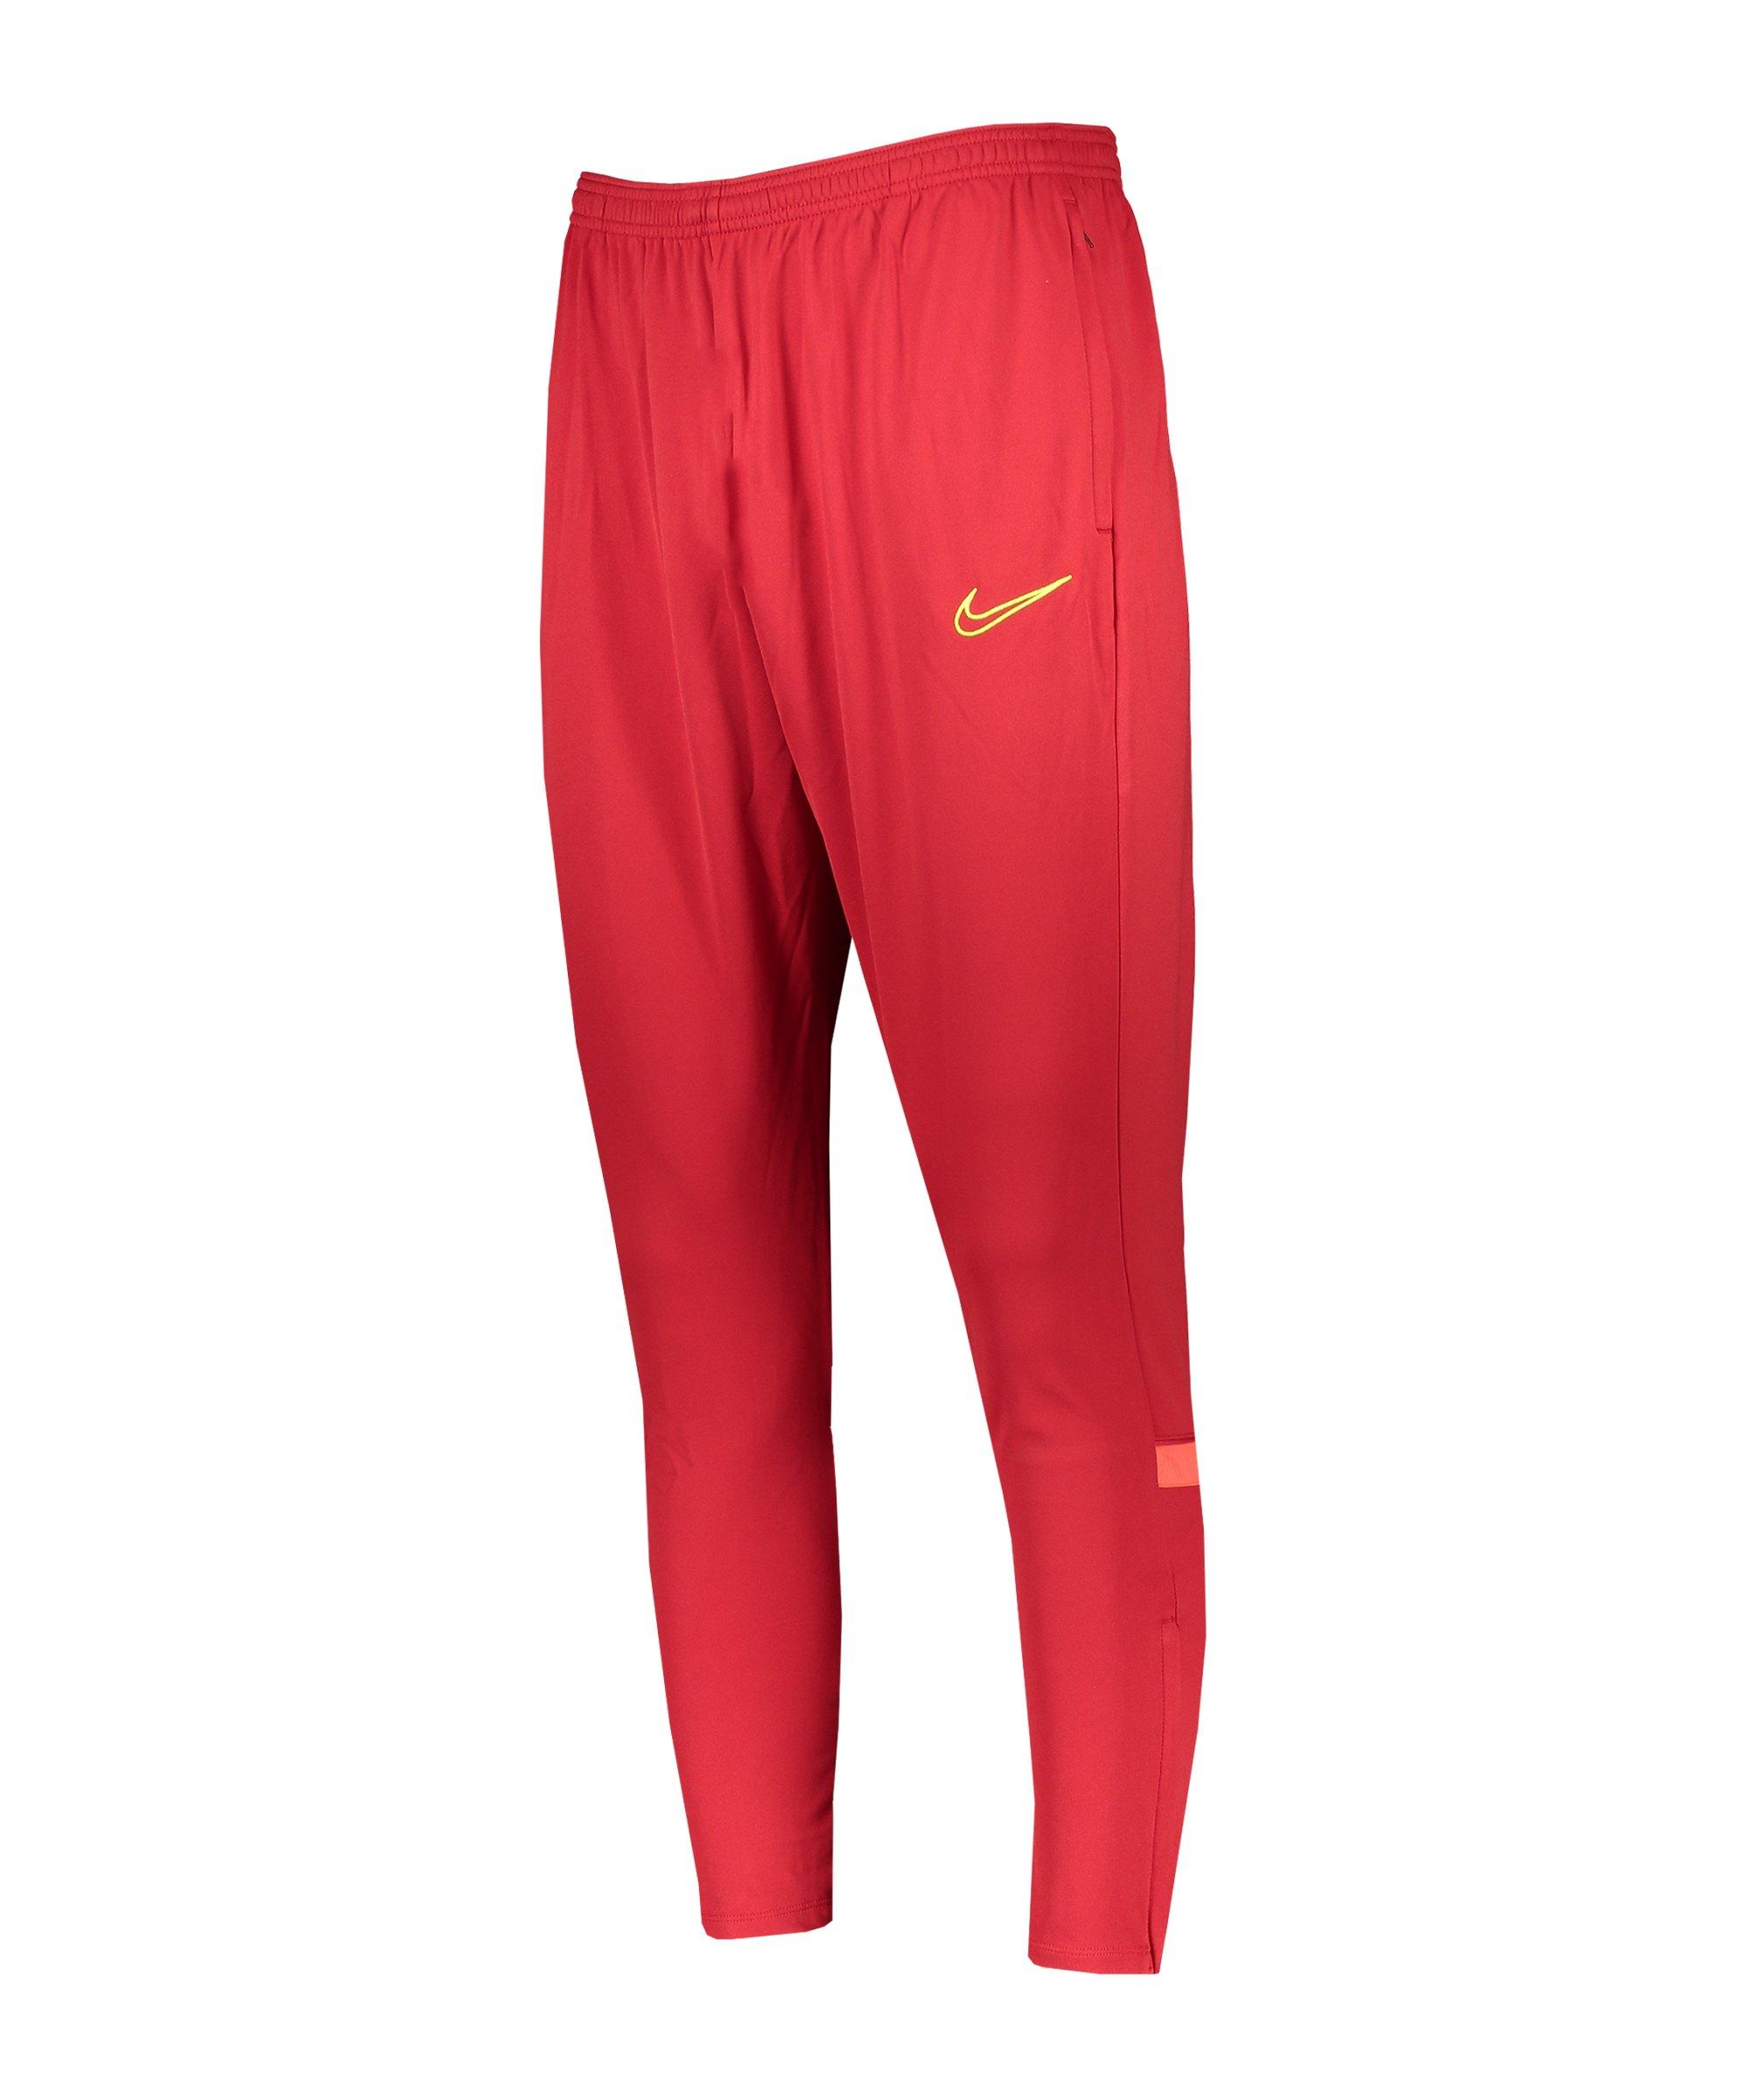 Nike Academy 21 Trainingshose Damen Rot F687 - rot